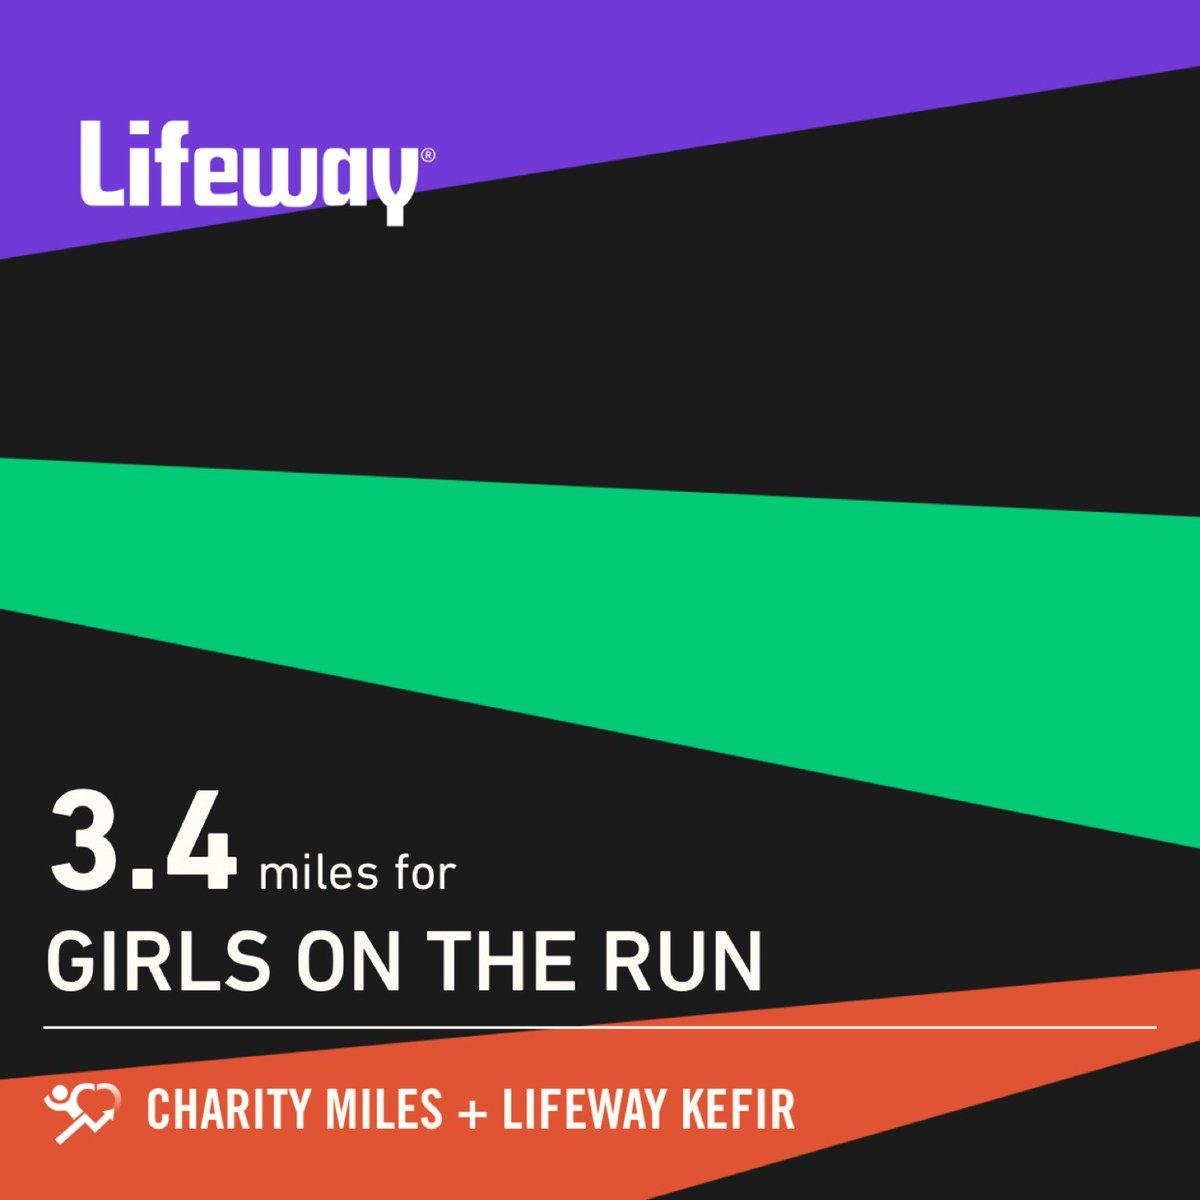 3.4 @CharityMiles for @GOTRI. Thanks to @Lifeway_Kefir. Good luck to everyone running the #BostonMarathon! #LoveYourGuts